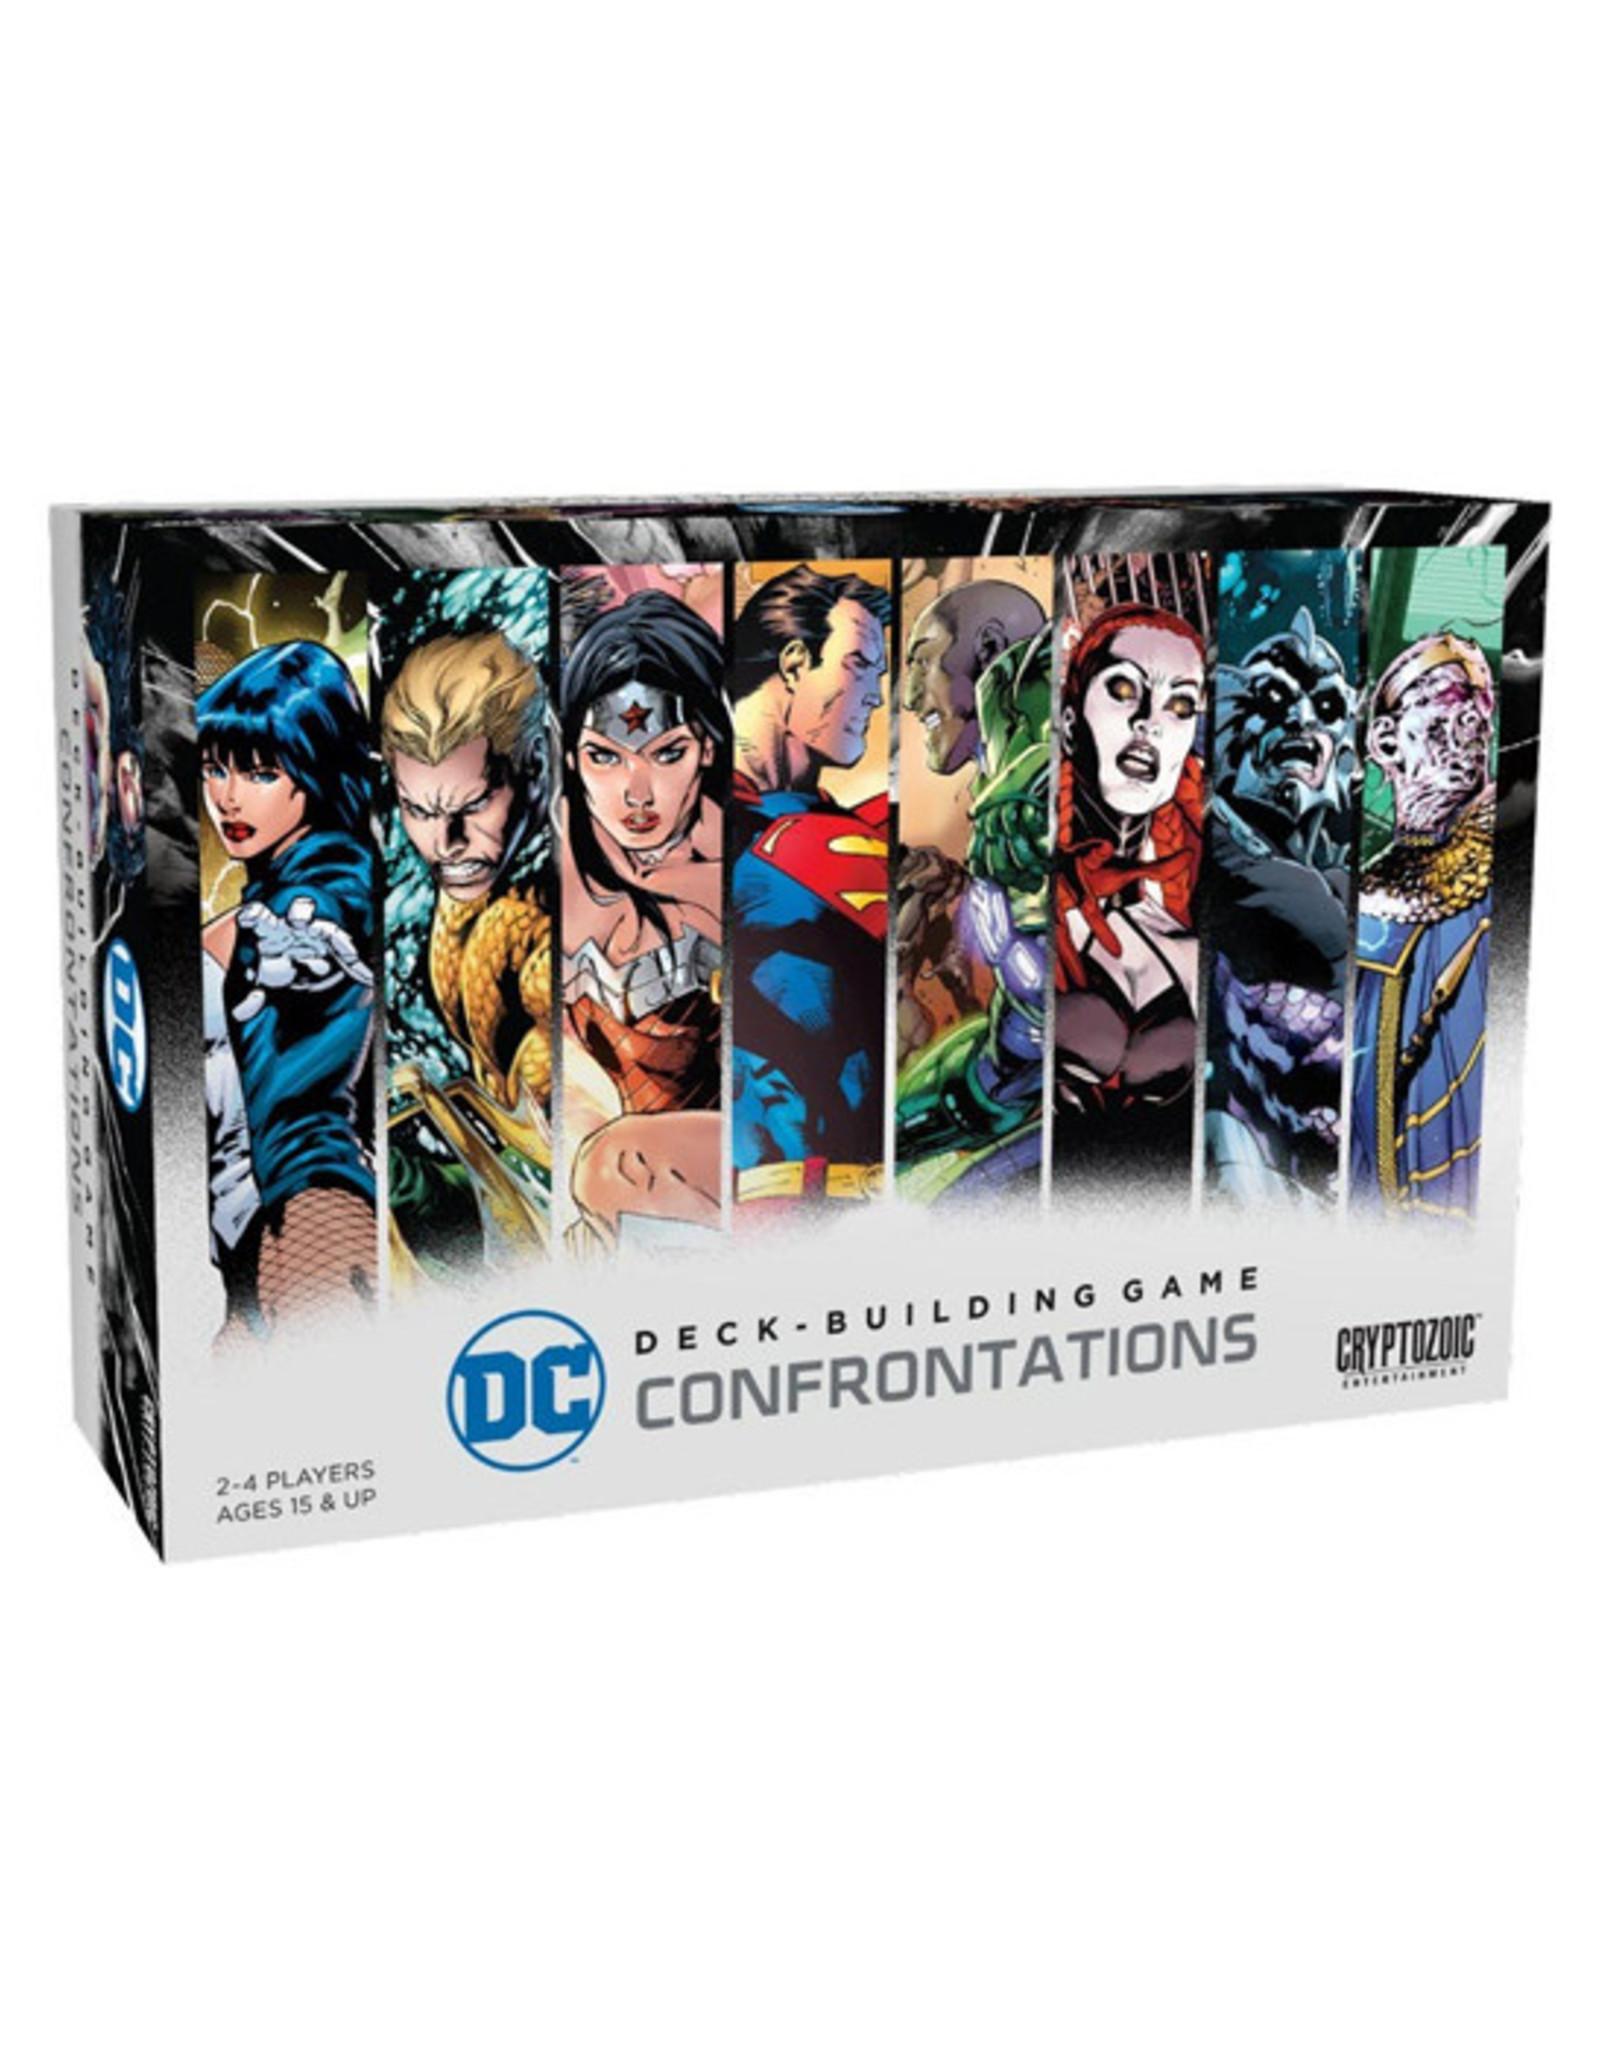 DC Deck Building Game: Confrontations